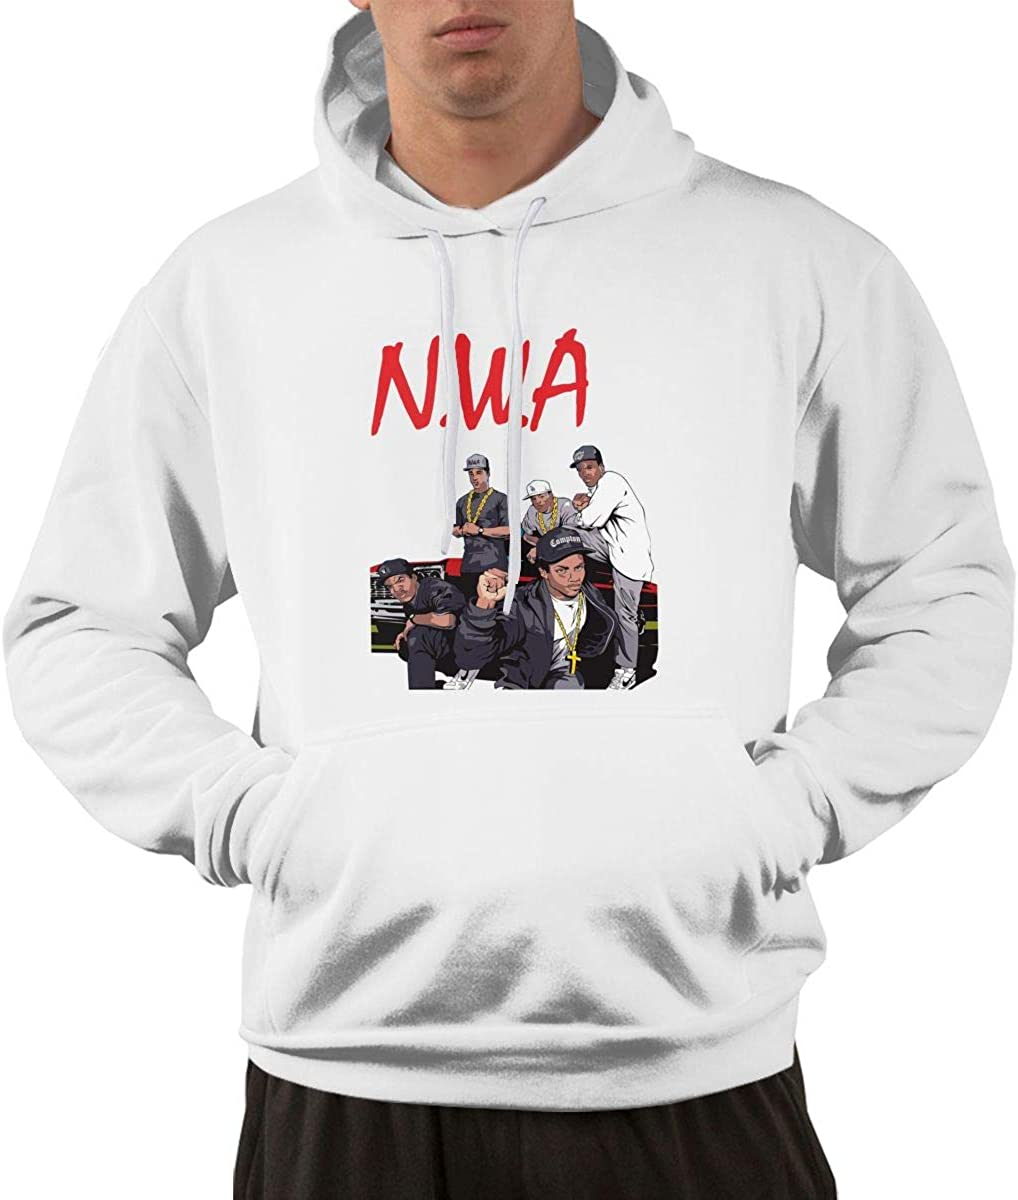 TIANBA Classic N.W.A Hoodie Sweatshirt for Men Black